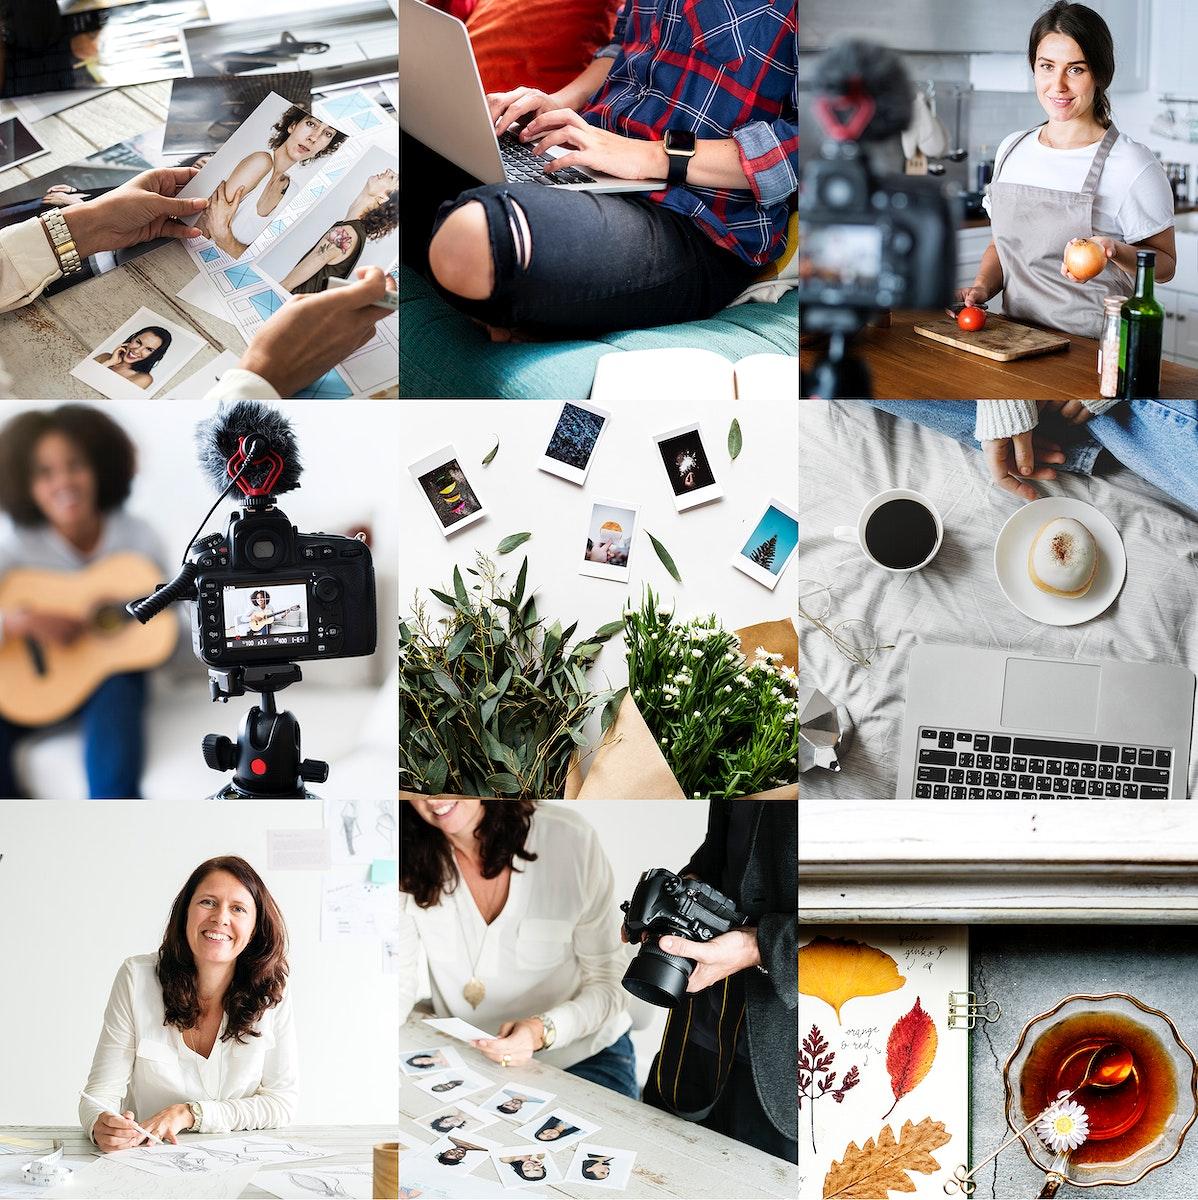 Online blogger recording an ideas